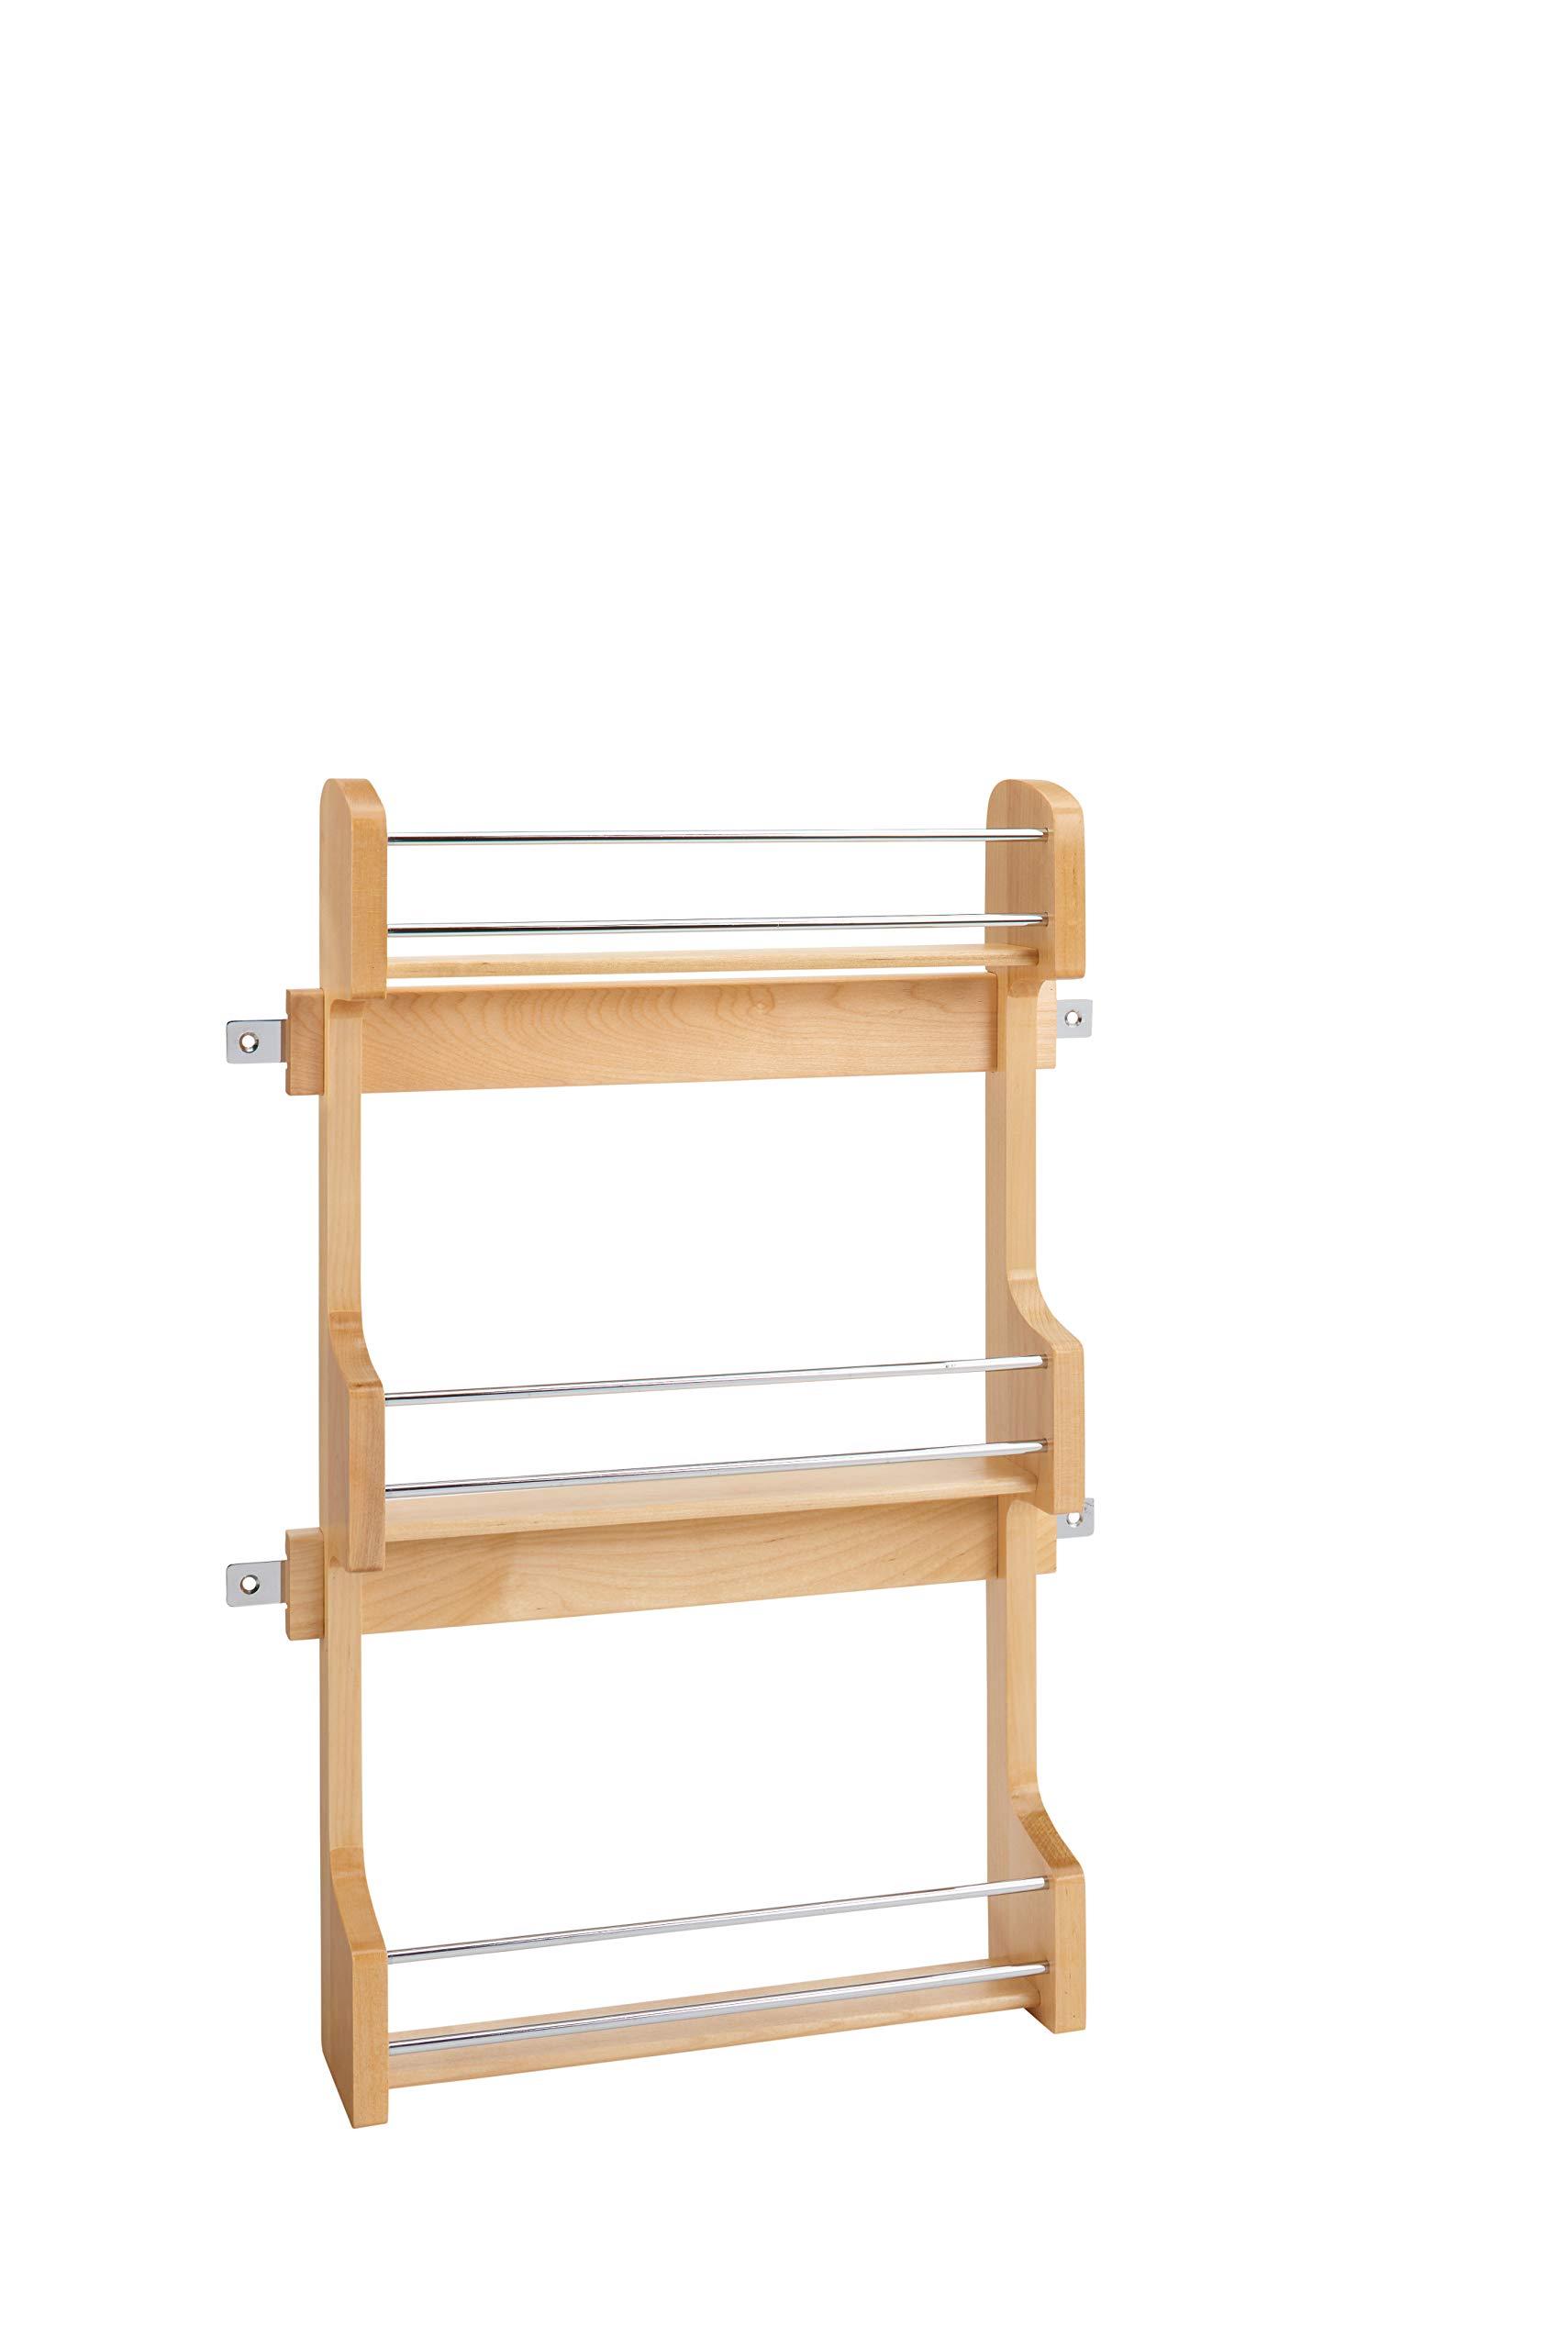 Rev-A-Shelf - 4SR-18 - Medium Cabinet Door Mount Wood 3-Shelf Spice Rack by Rev-A-Shelf